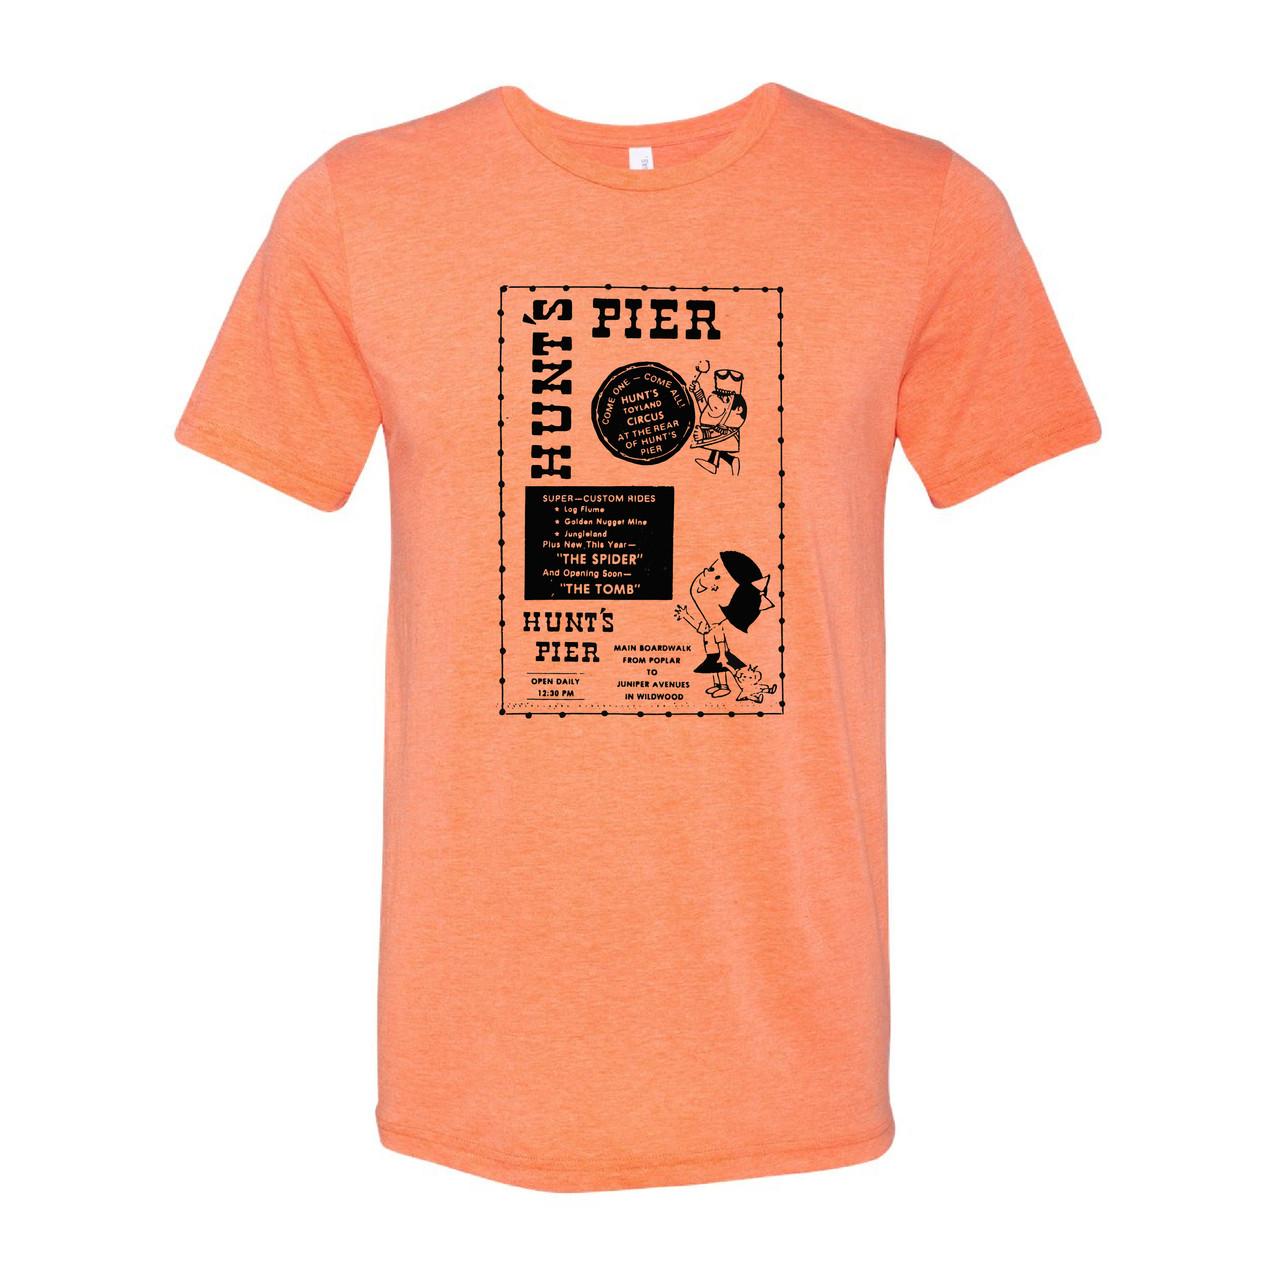 Hunt's Pier orange